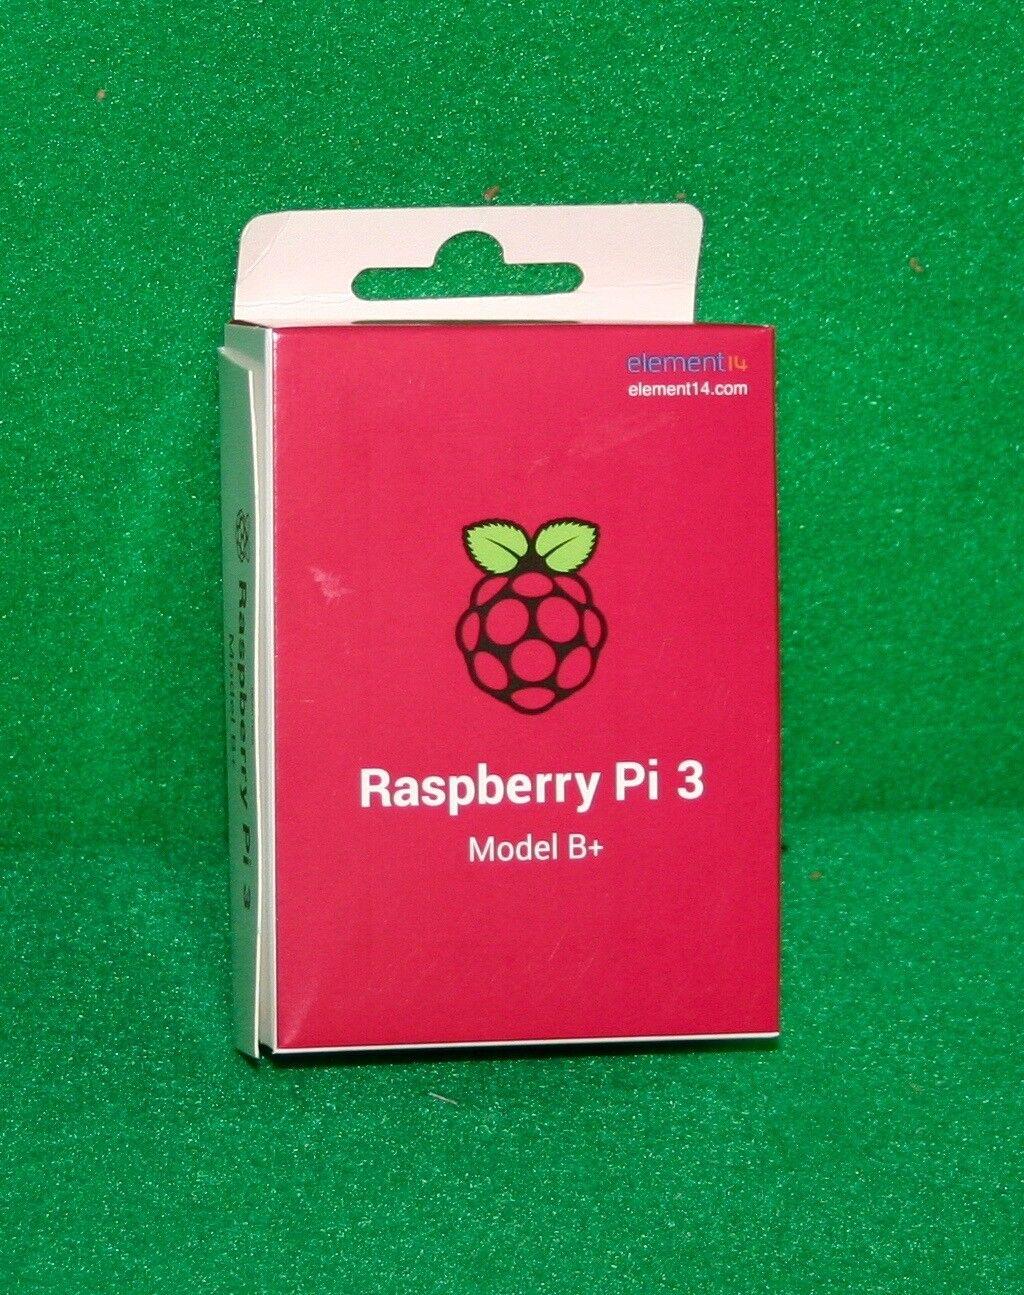 Raspberry PI 3 Model B+ 1.4GHz 4x Core 64 Bit 1GB WIFI Motherboard PC Computer